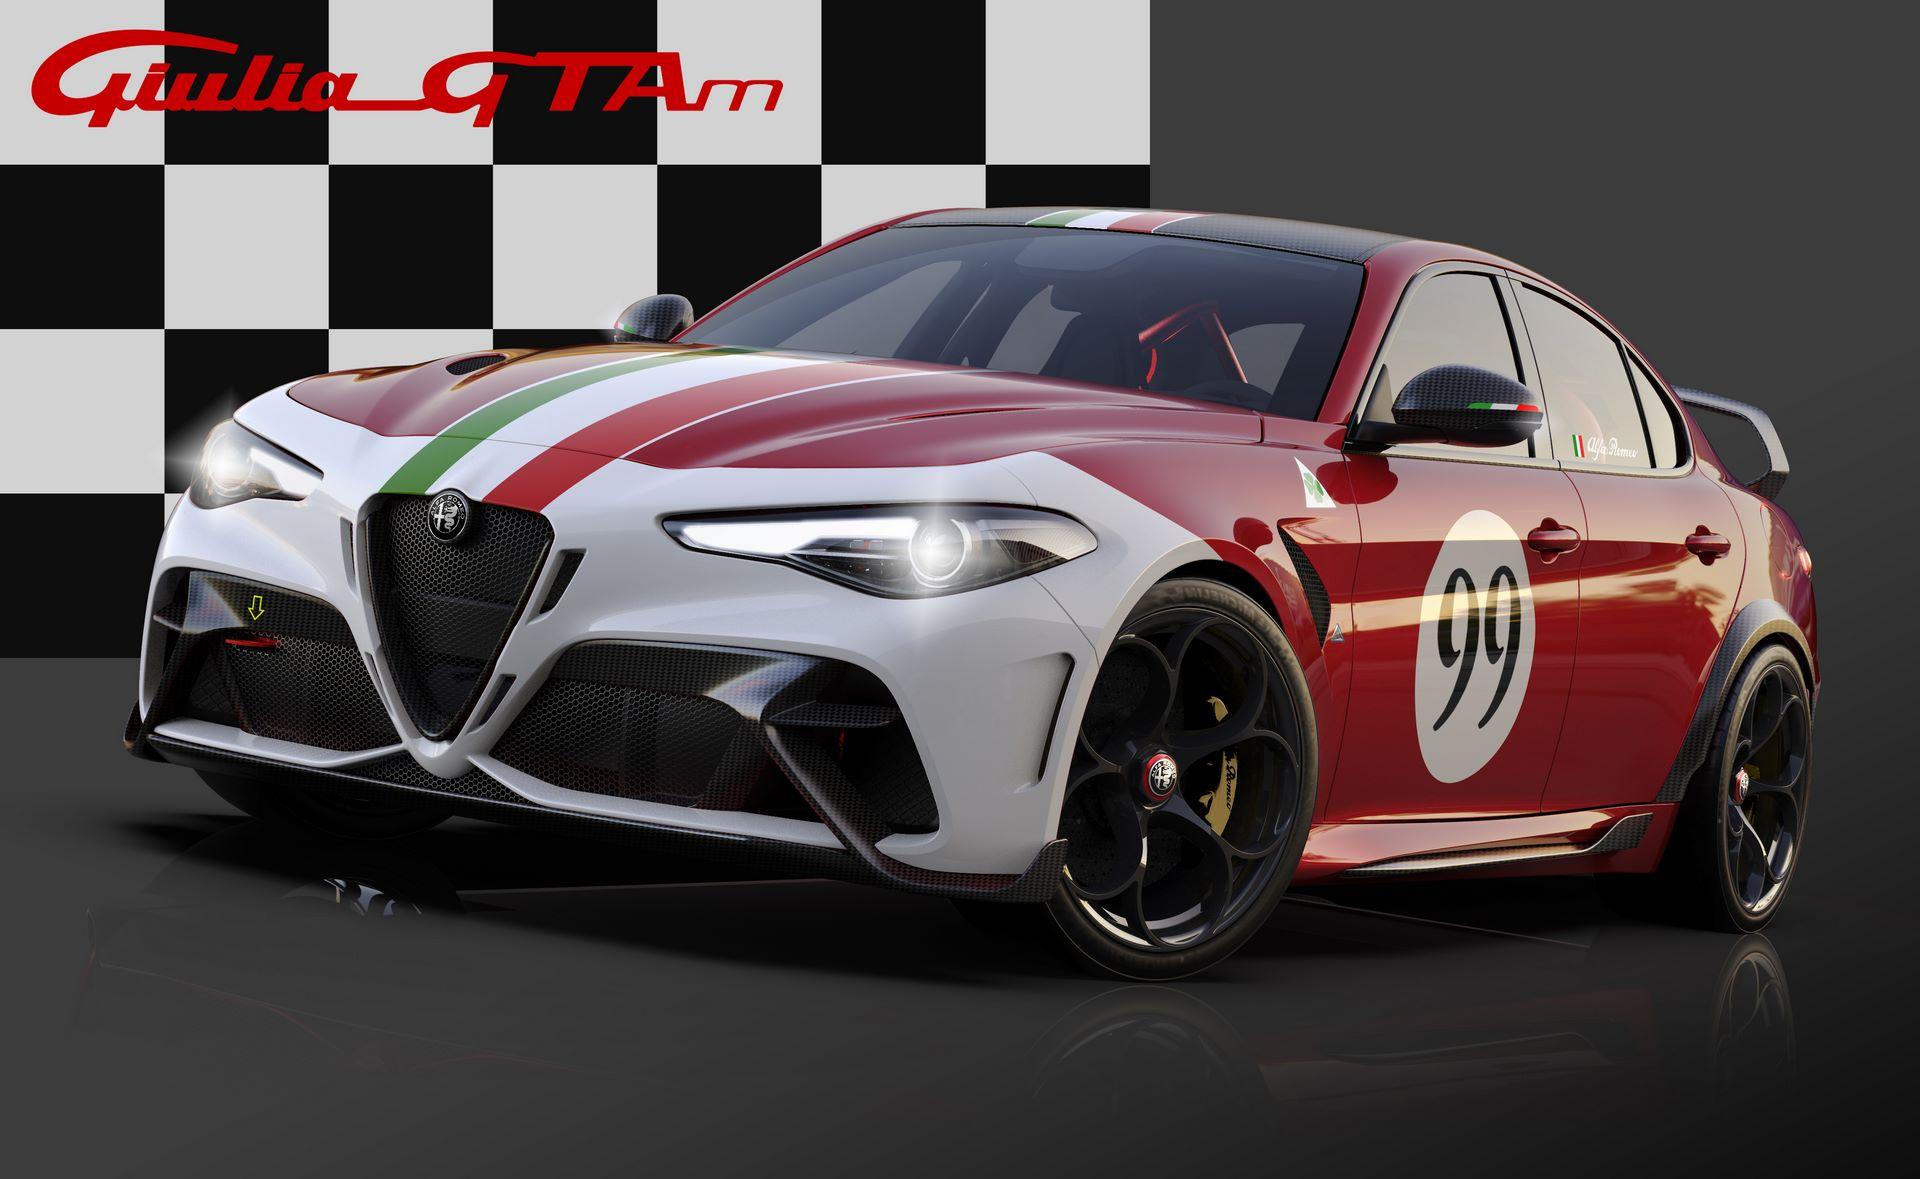 27_Alfa-Romeo-Giulia-GTA-dedicated-Livery